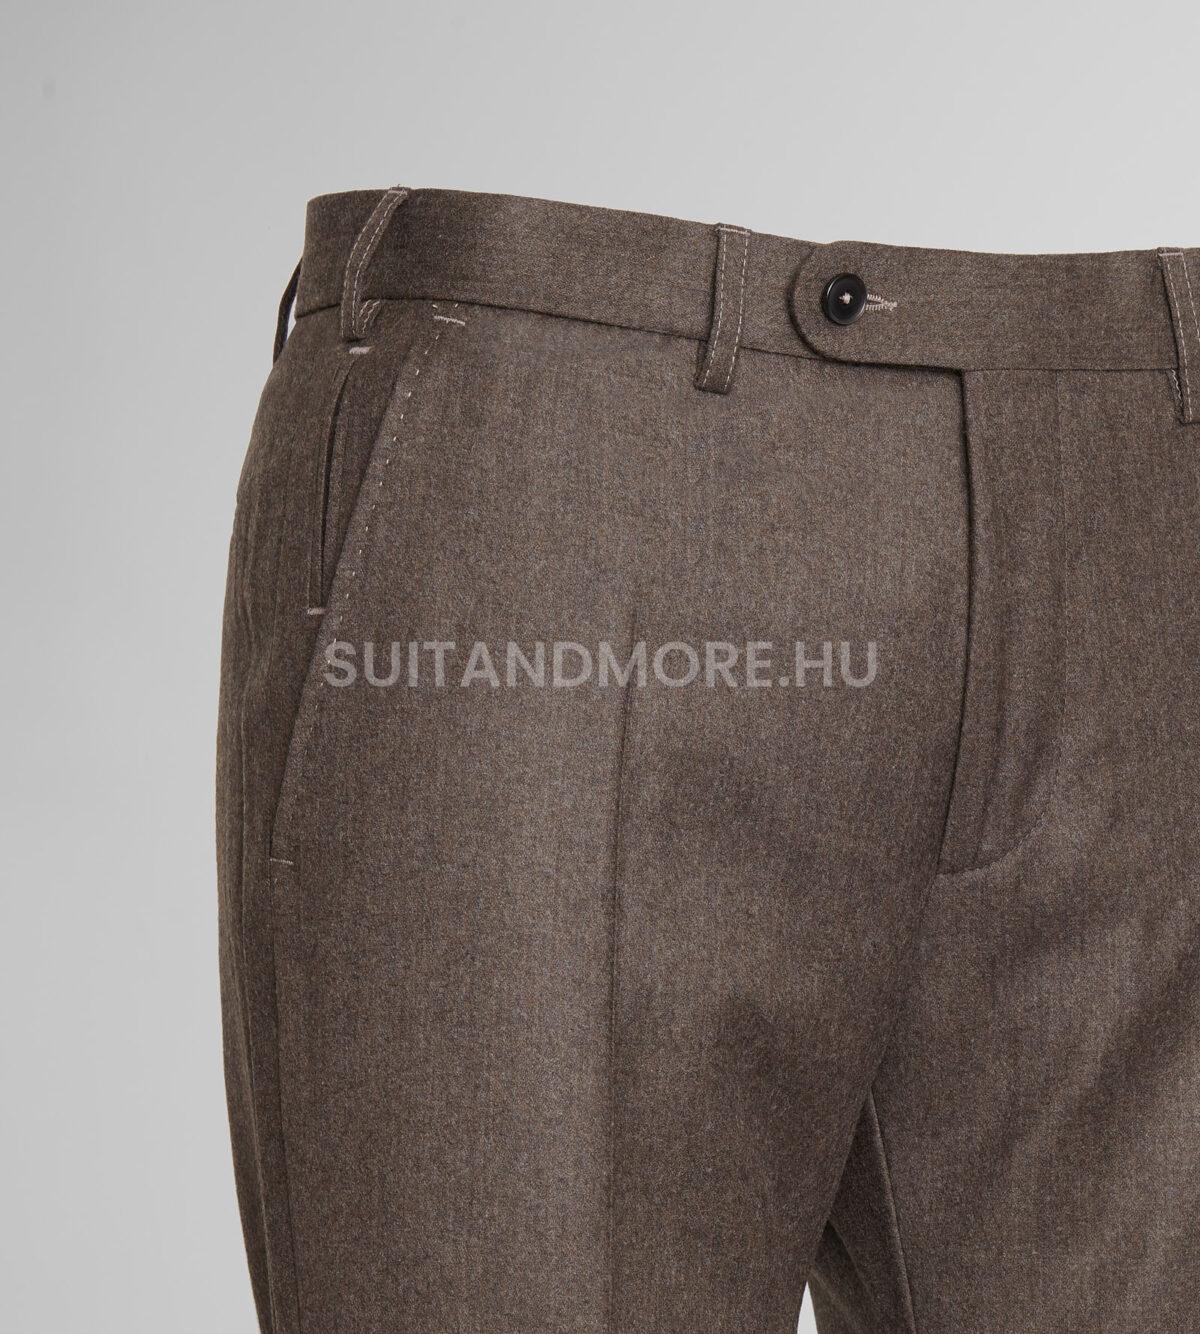 digel-kozepbarna-modern-fit-gyapju-kasmir-szovetnadrag-sergio-1201209-38